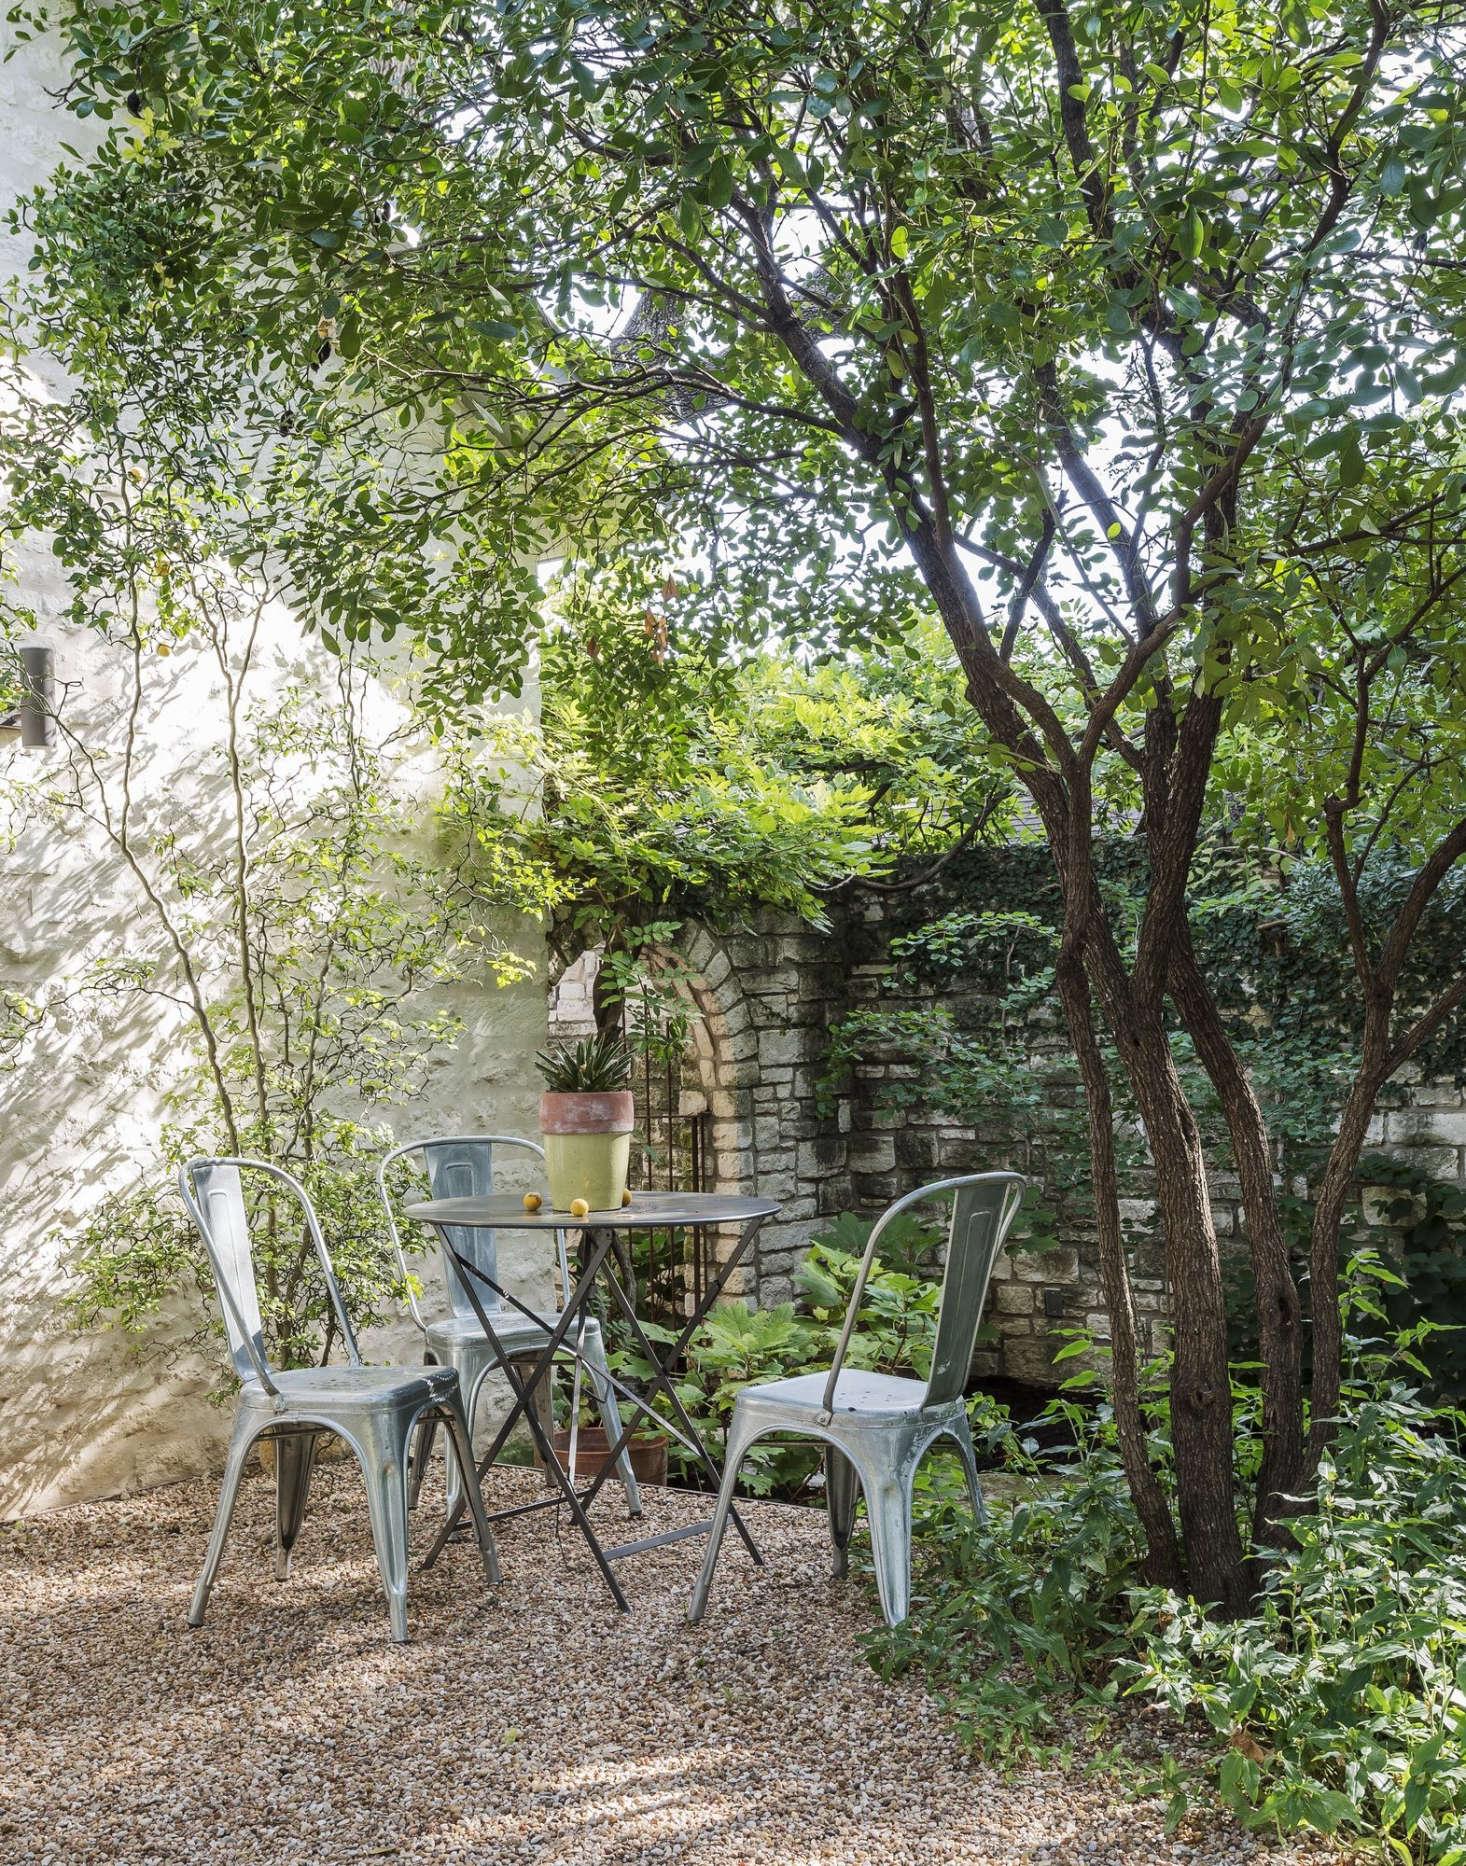 The New Gravel Backyard: 10 Inspiring Landscape Designs ...